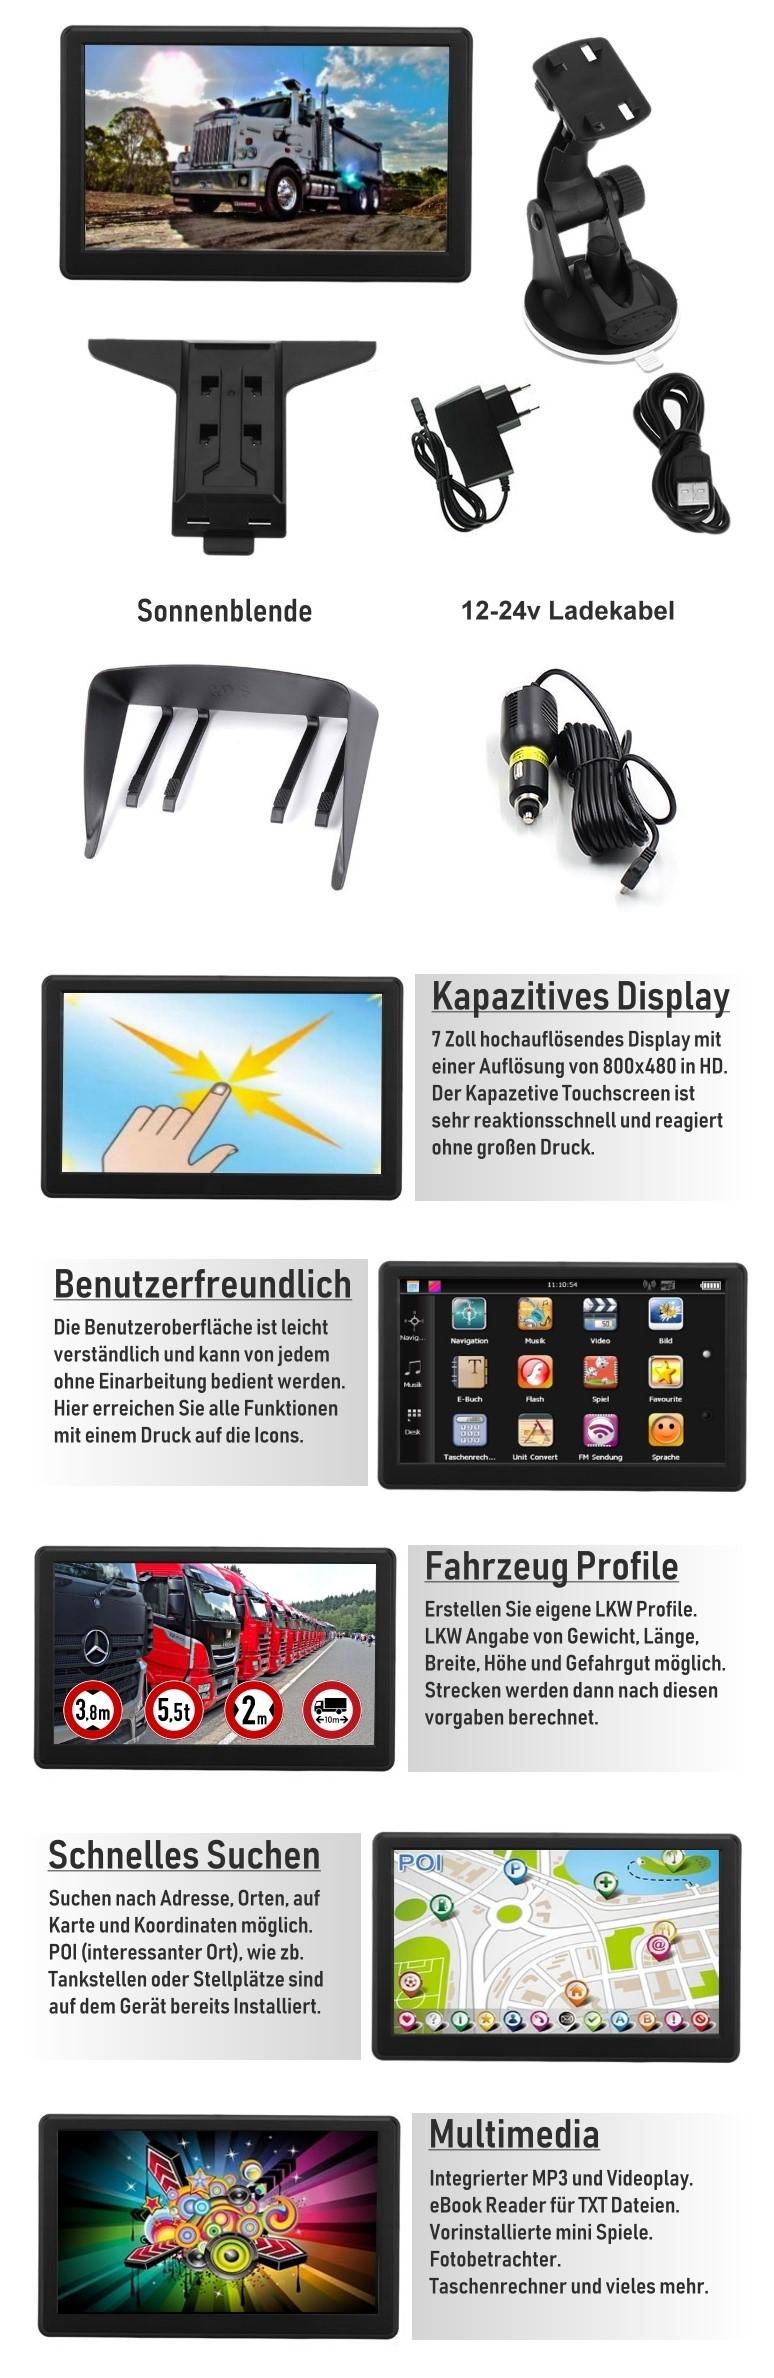 7 zoll navigationsger t f r reisemobil wohnmobil lkw pkw. Black Bedroom Furniture Sets. Home Design Ideas